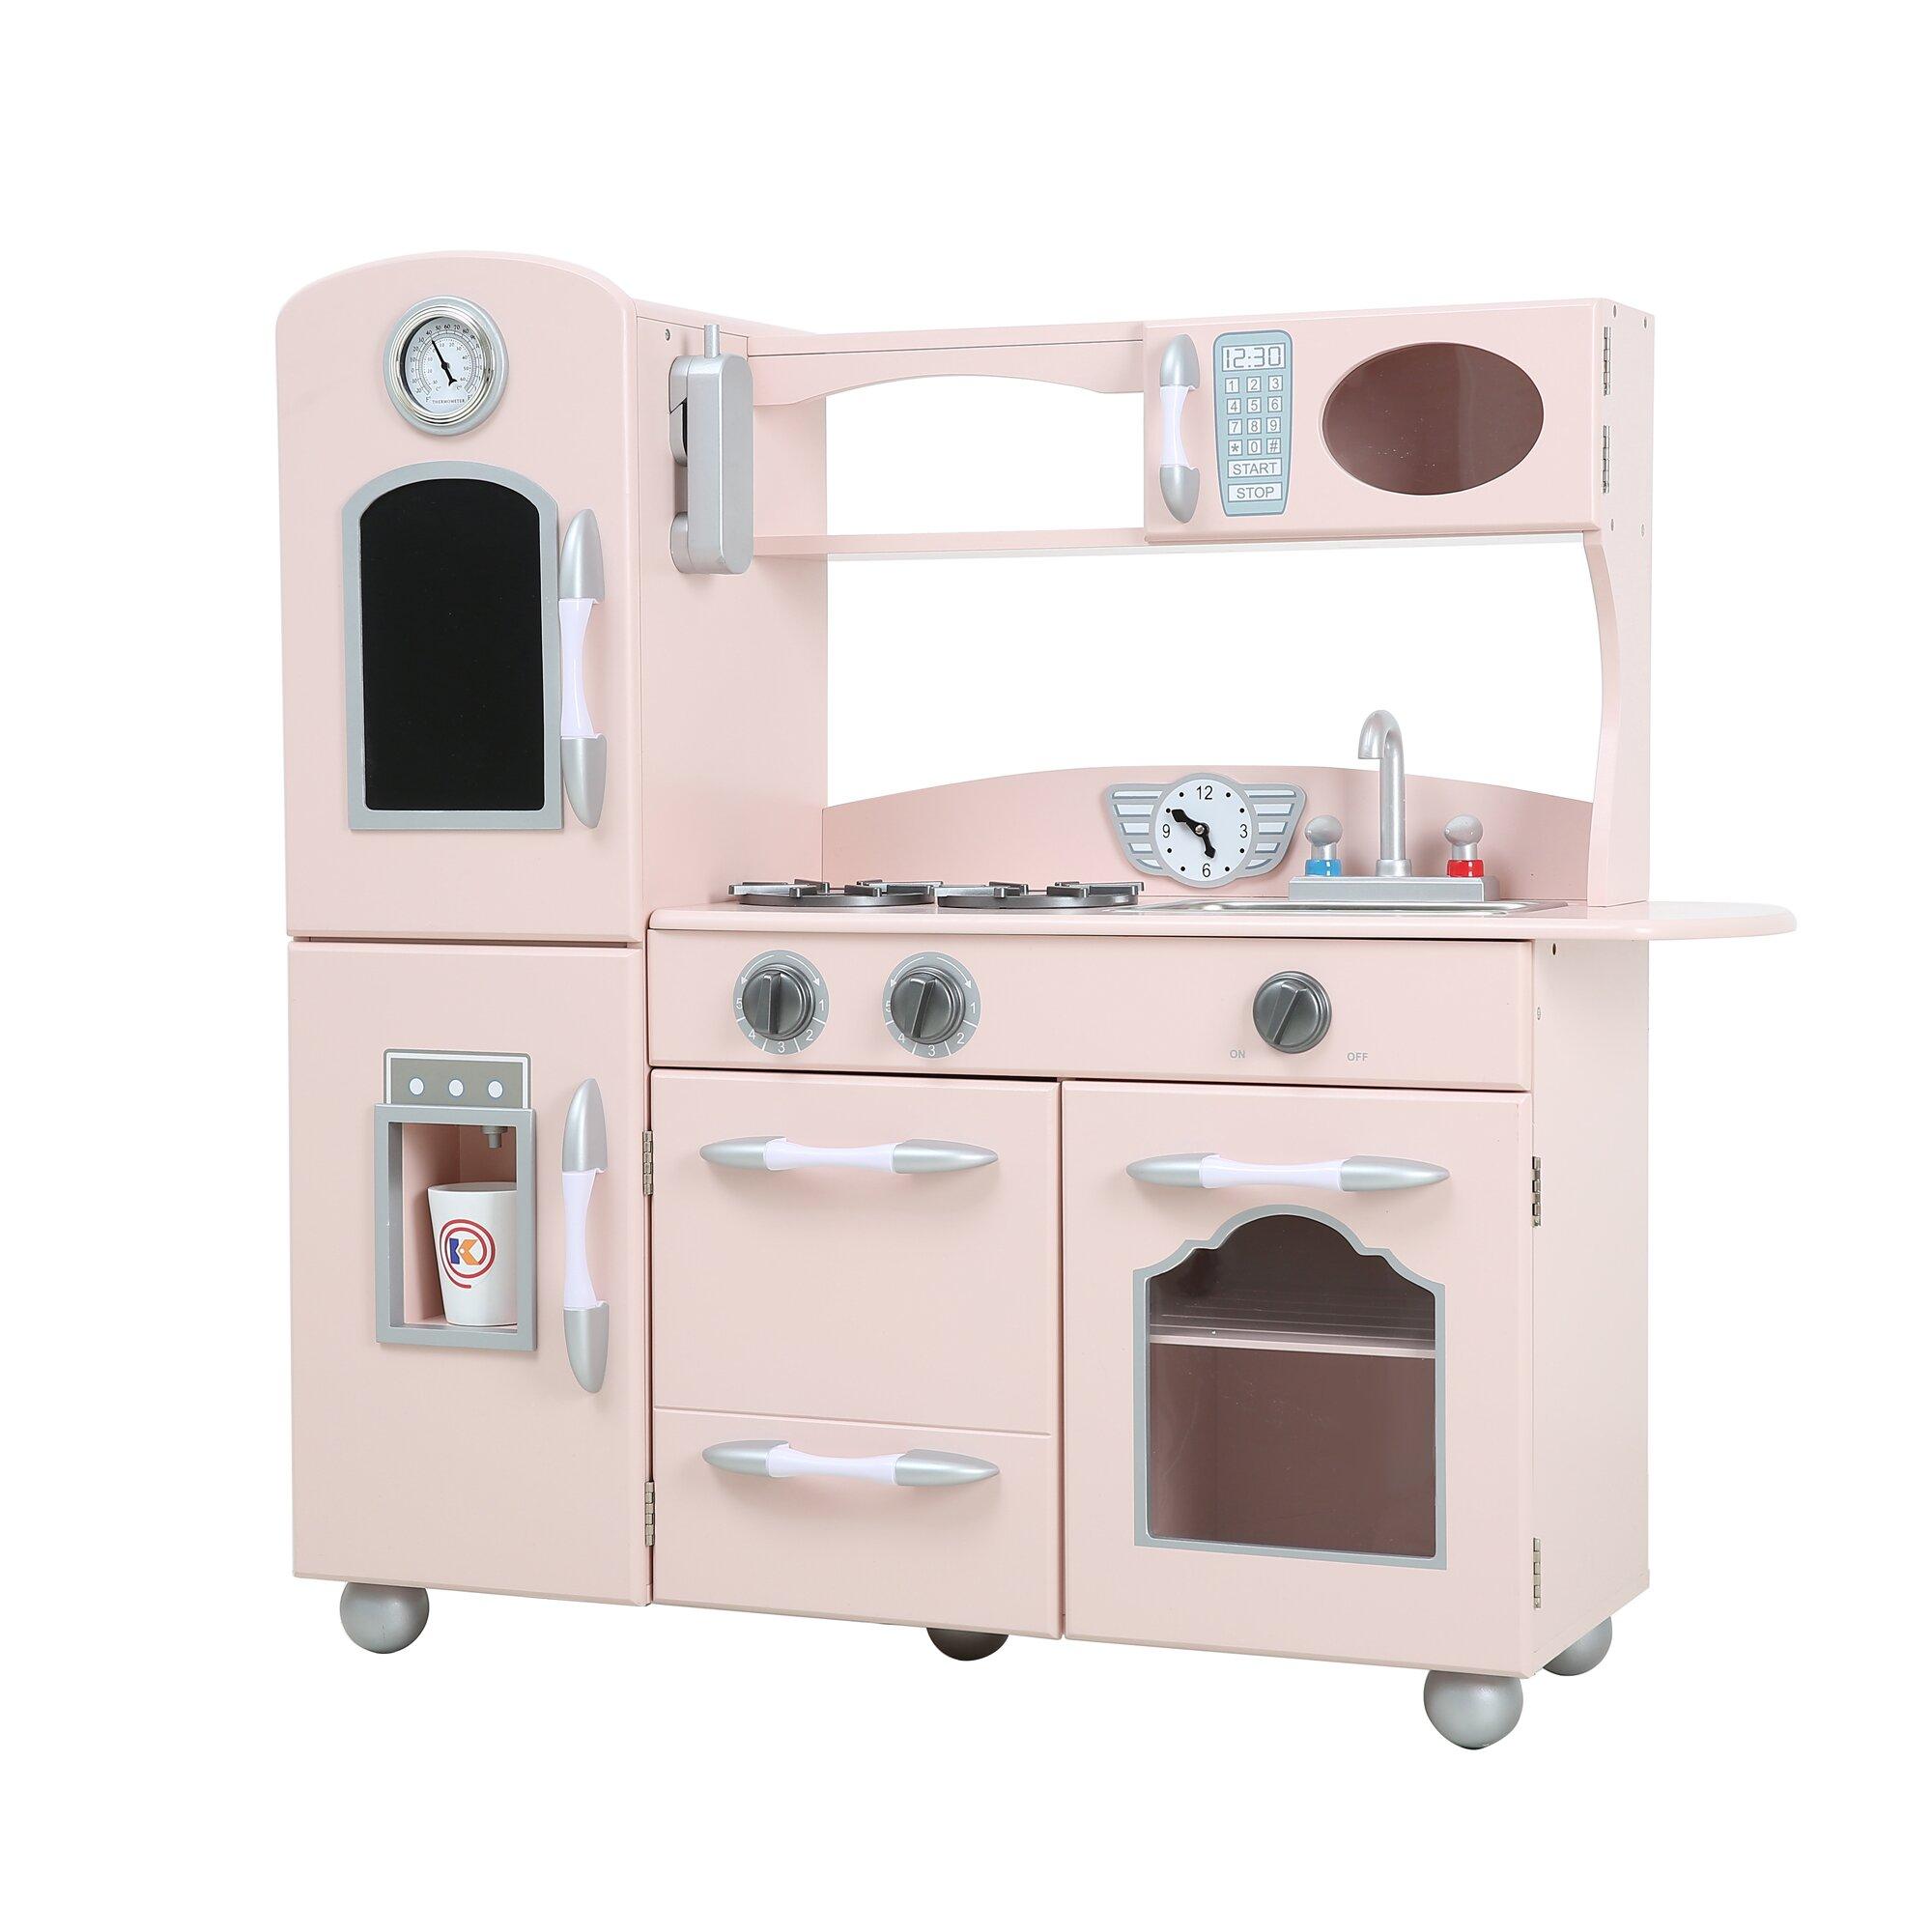 Wooden Kitchen Sets ~ Teamson kids wooden play kitchen set reviews wayfair